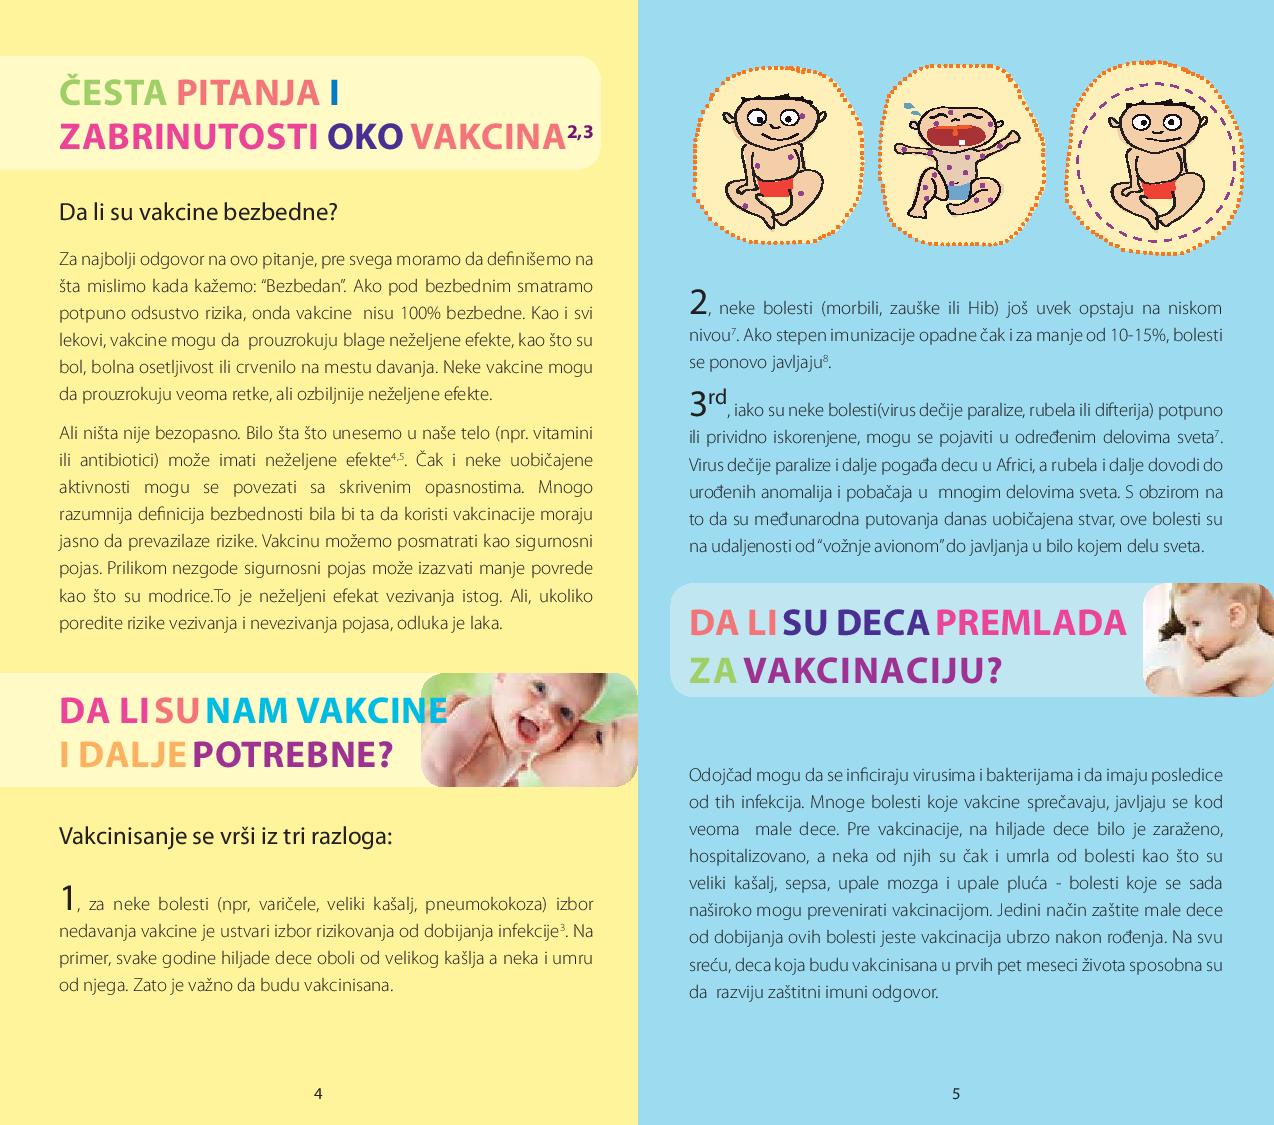 12332_BroshuraVACCINESbaby_Srubski_108x190_Idea01-01b bez vacc kartona.3-page-001